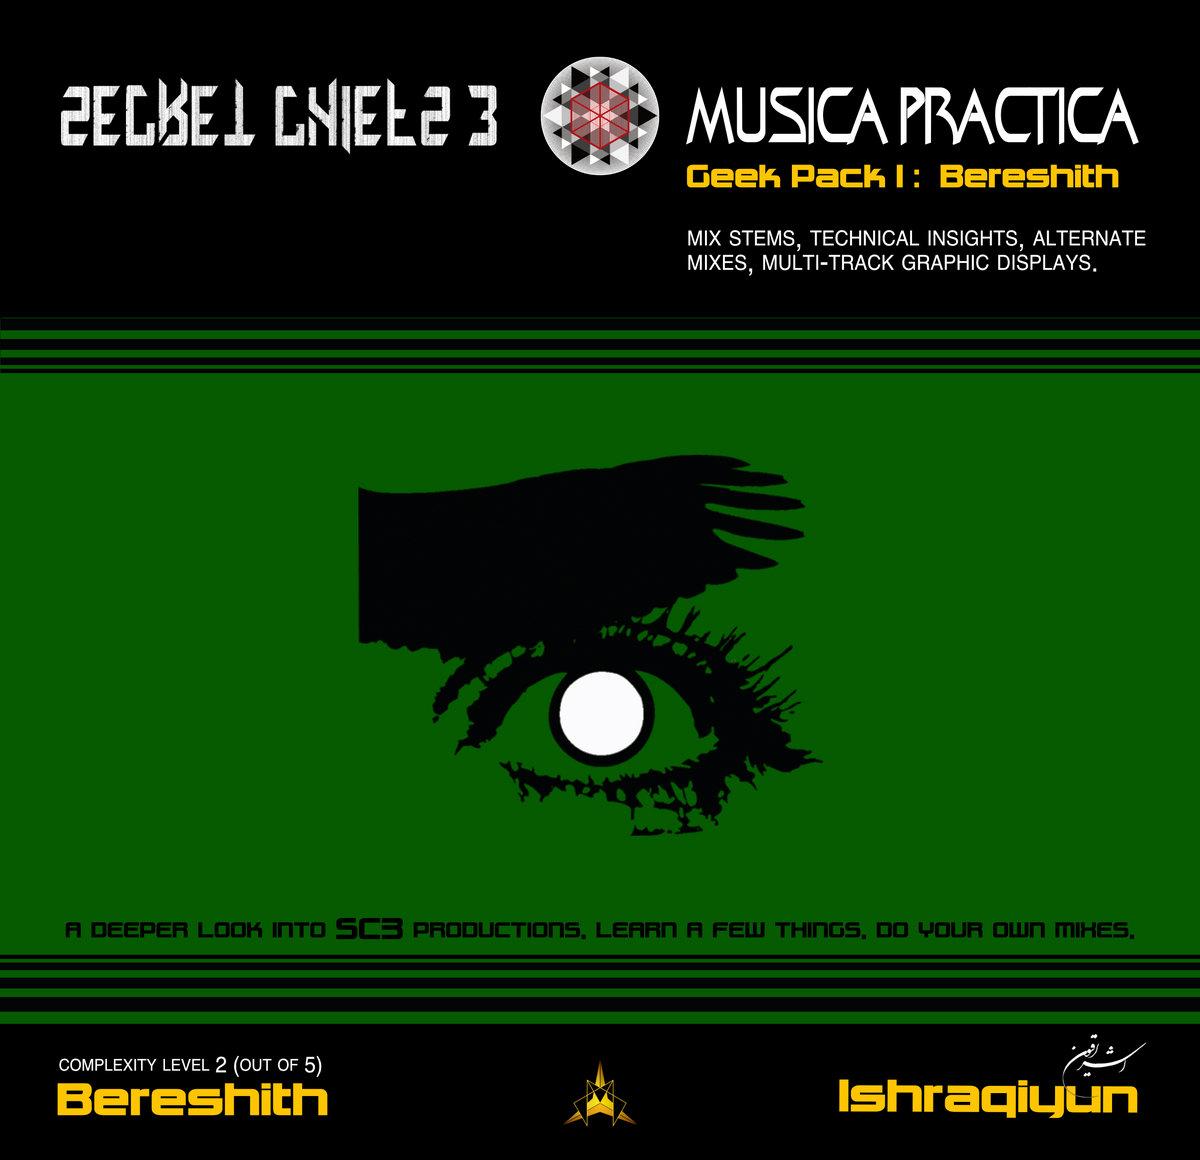 MUSICA PRACTICA *Geek Pack One*: Bereshith | Secret Chiefs 3